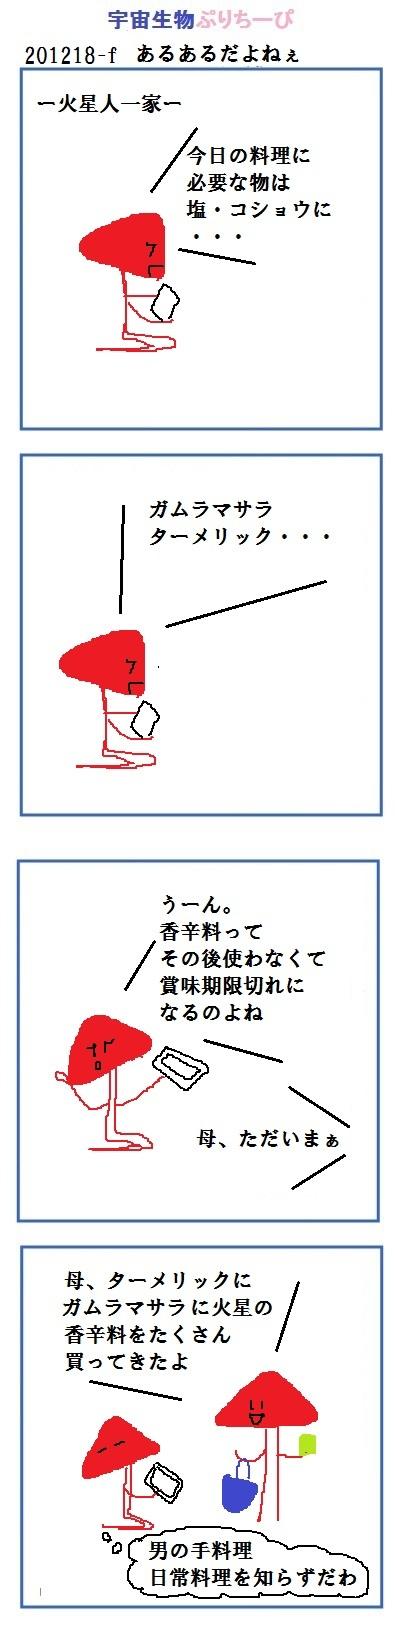 201218-f-pry.jpg